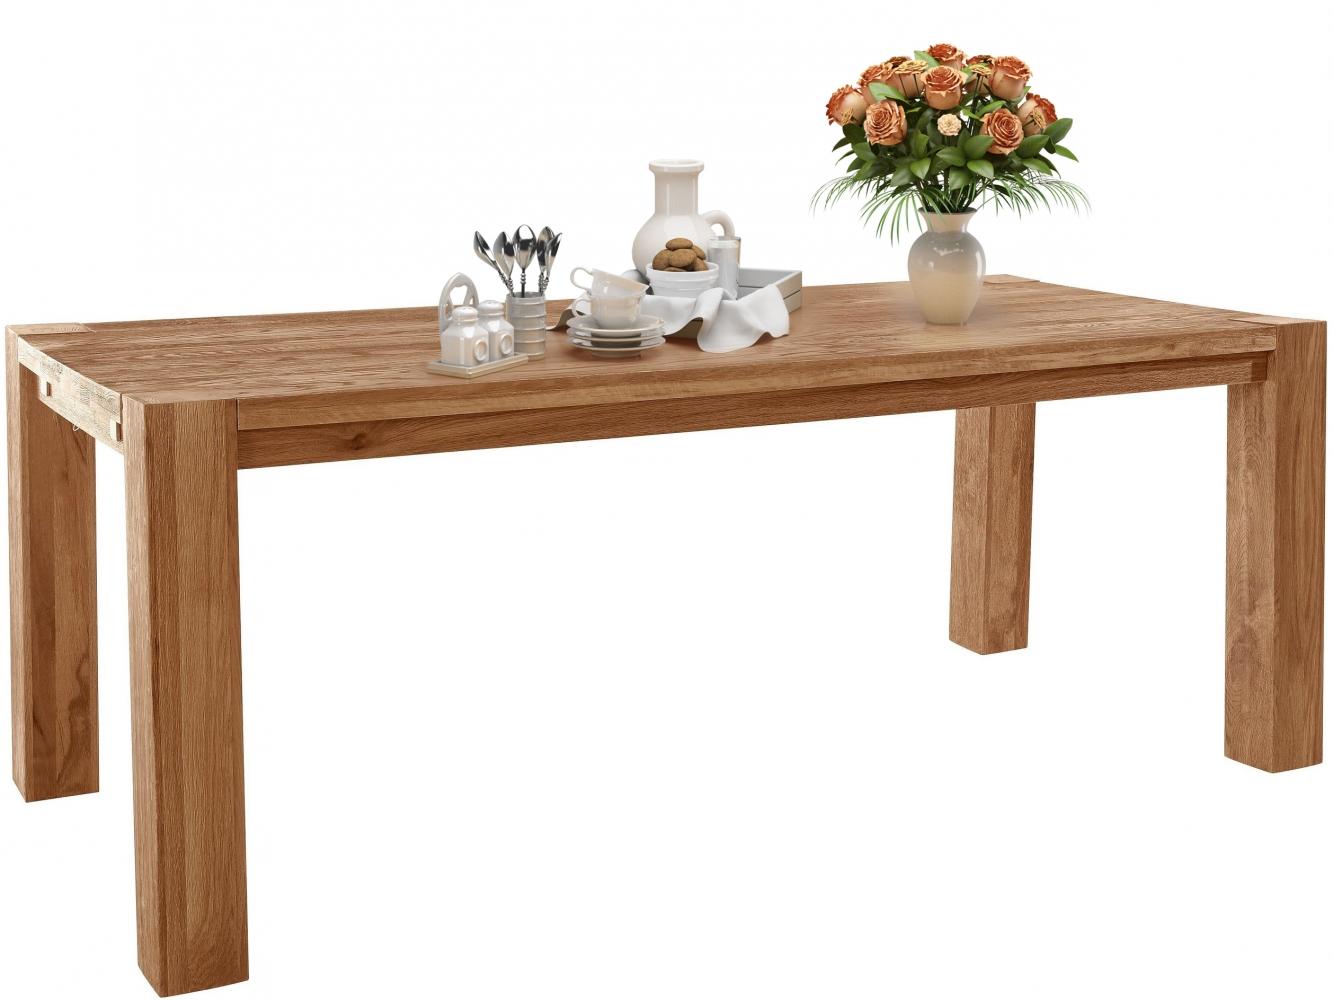 Jídelní stůl Sibera, 200 cm, dub